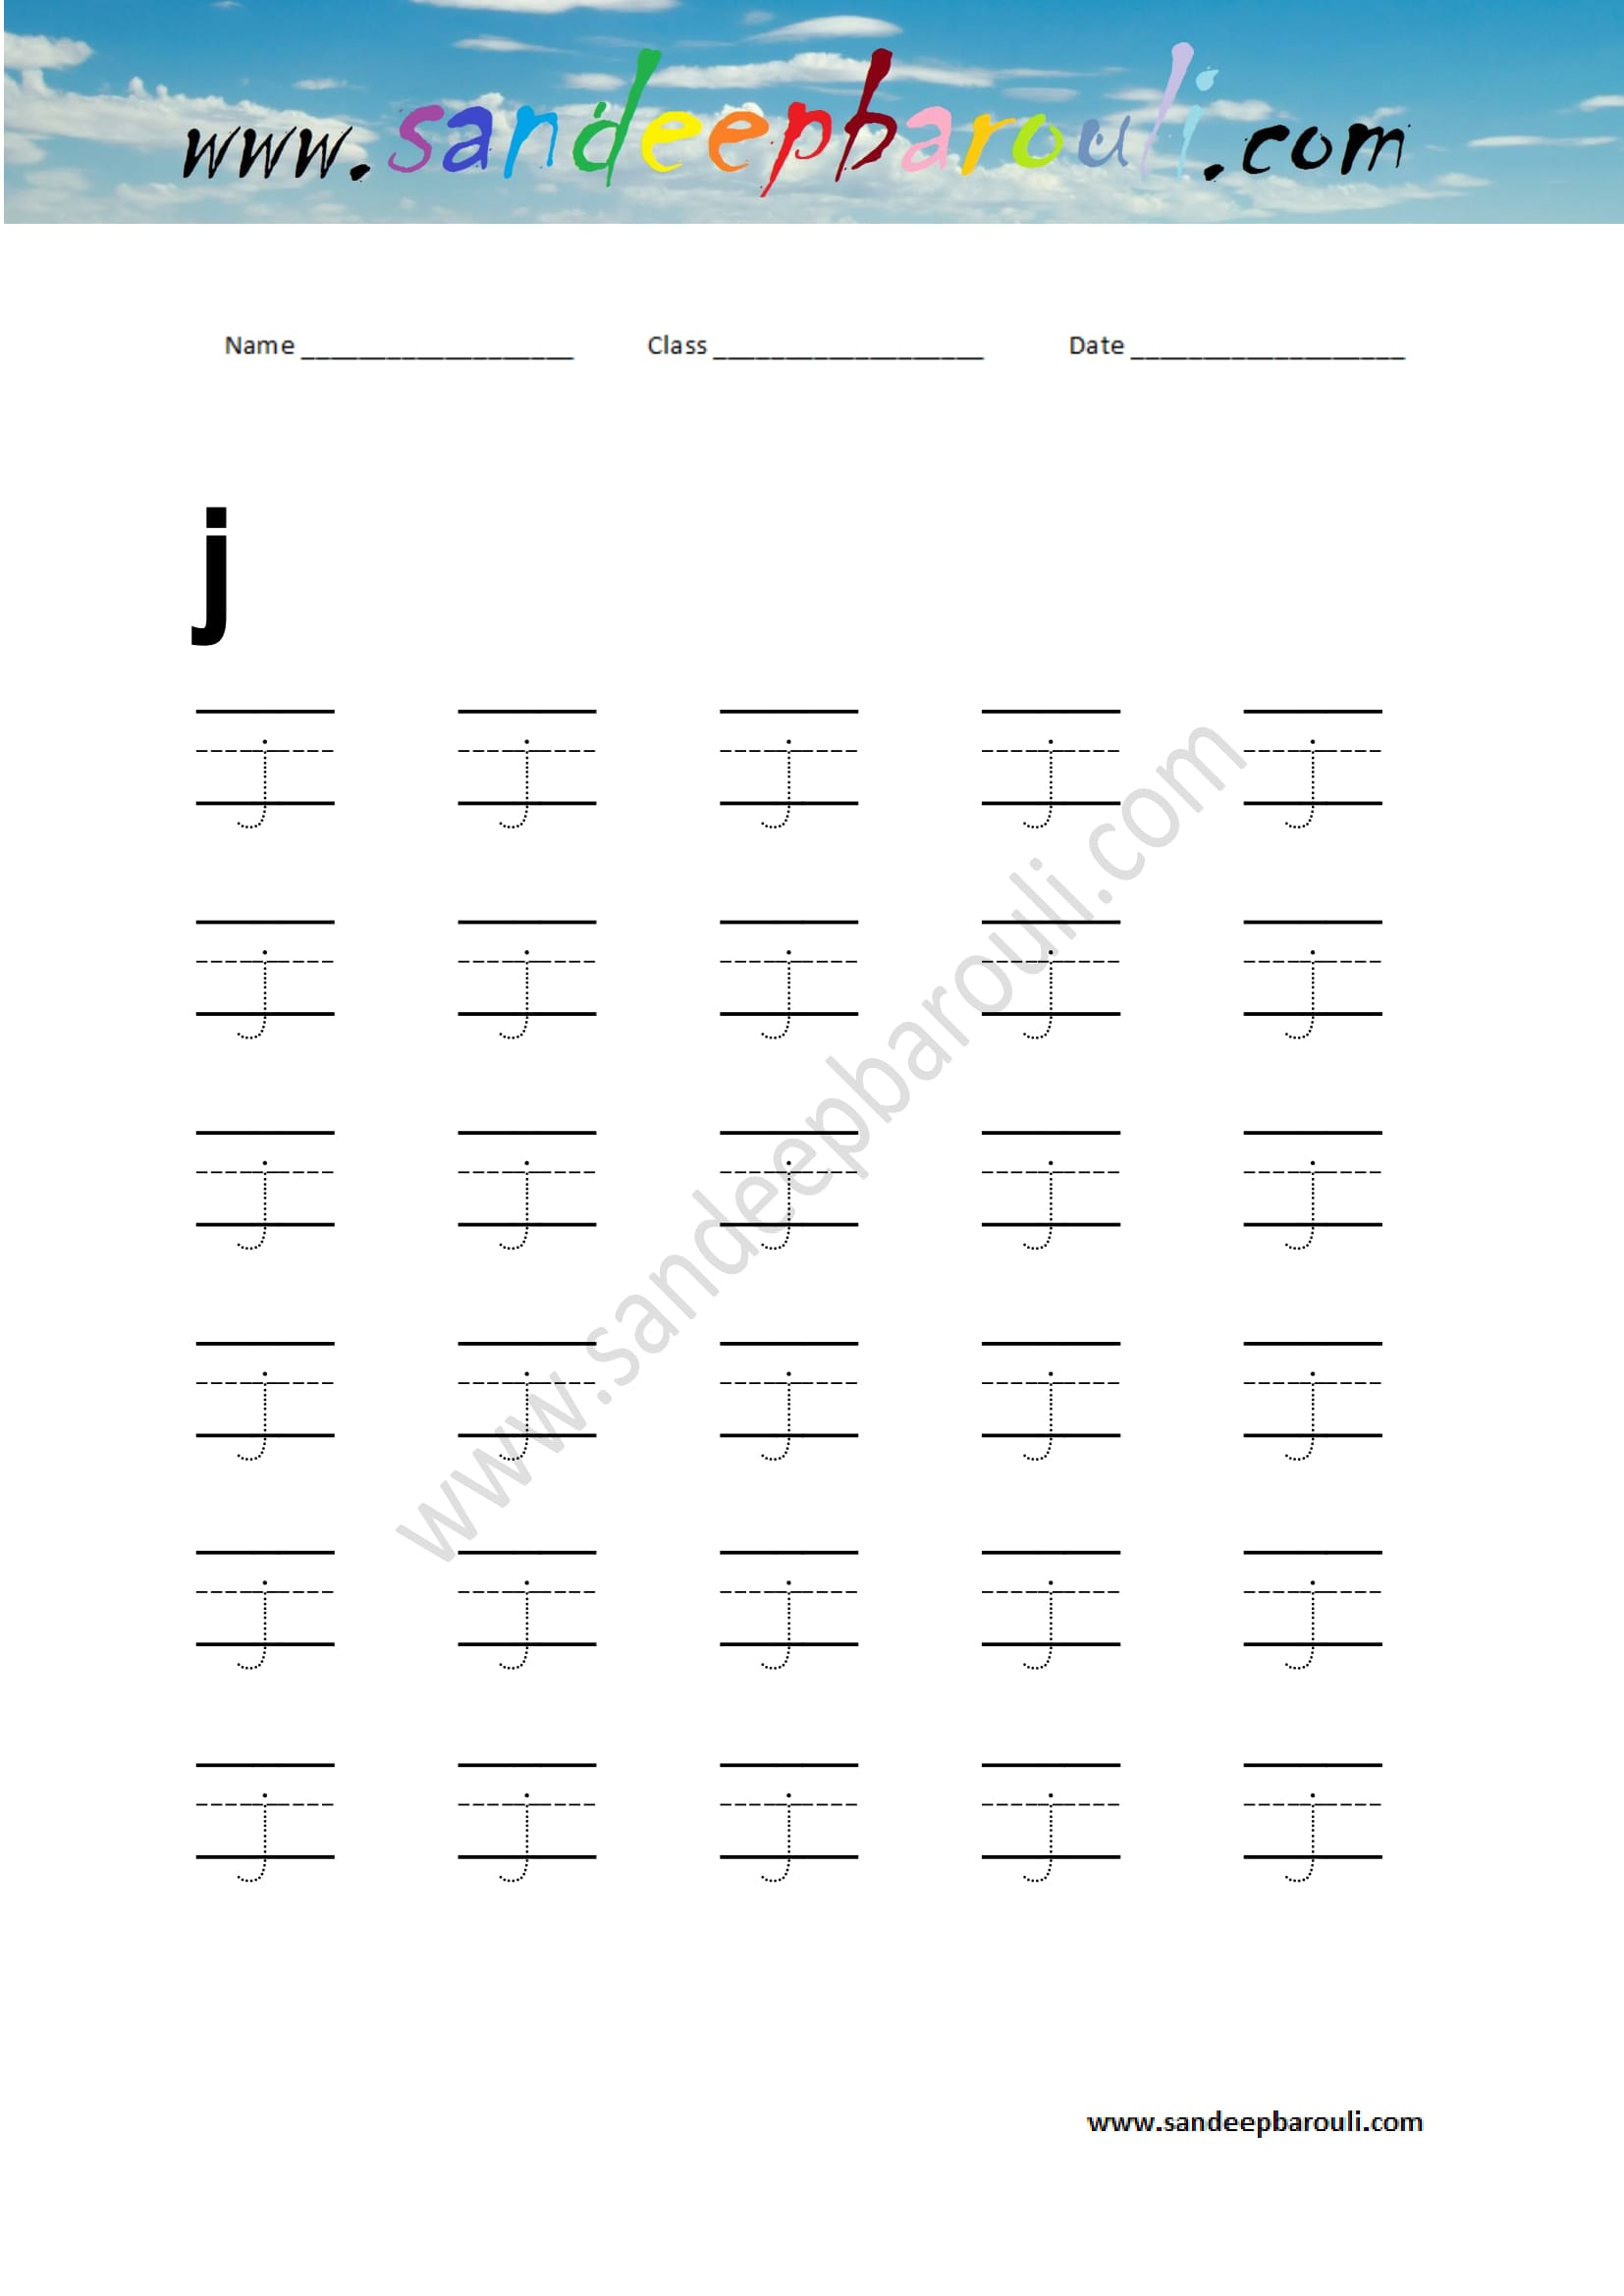 Handwriting Practice Letter J Sandeepbarouli